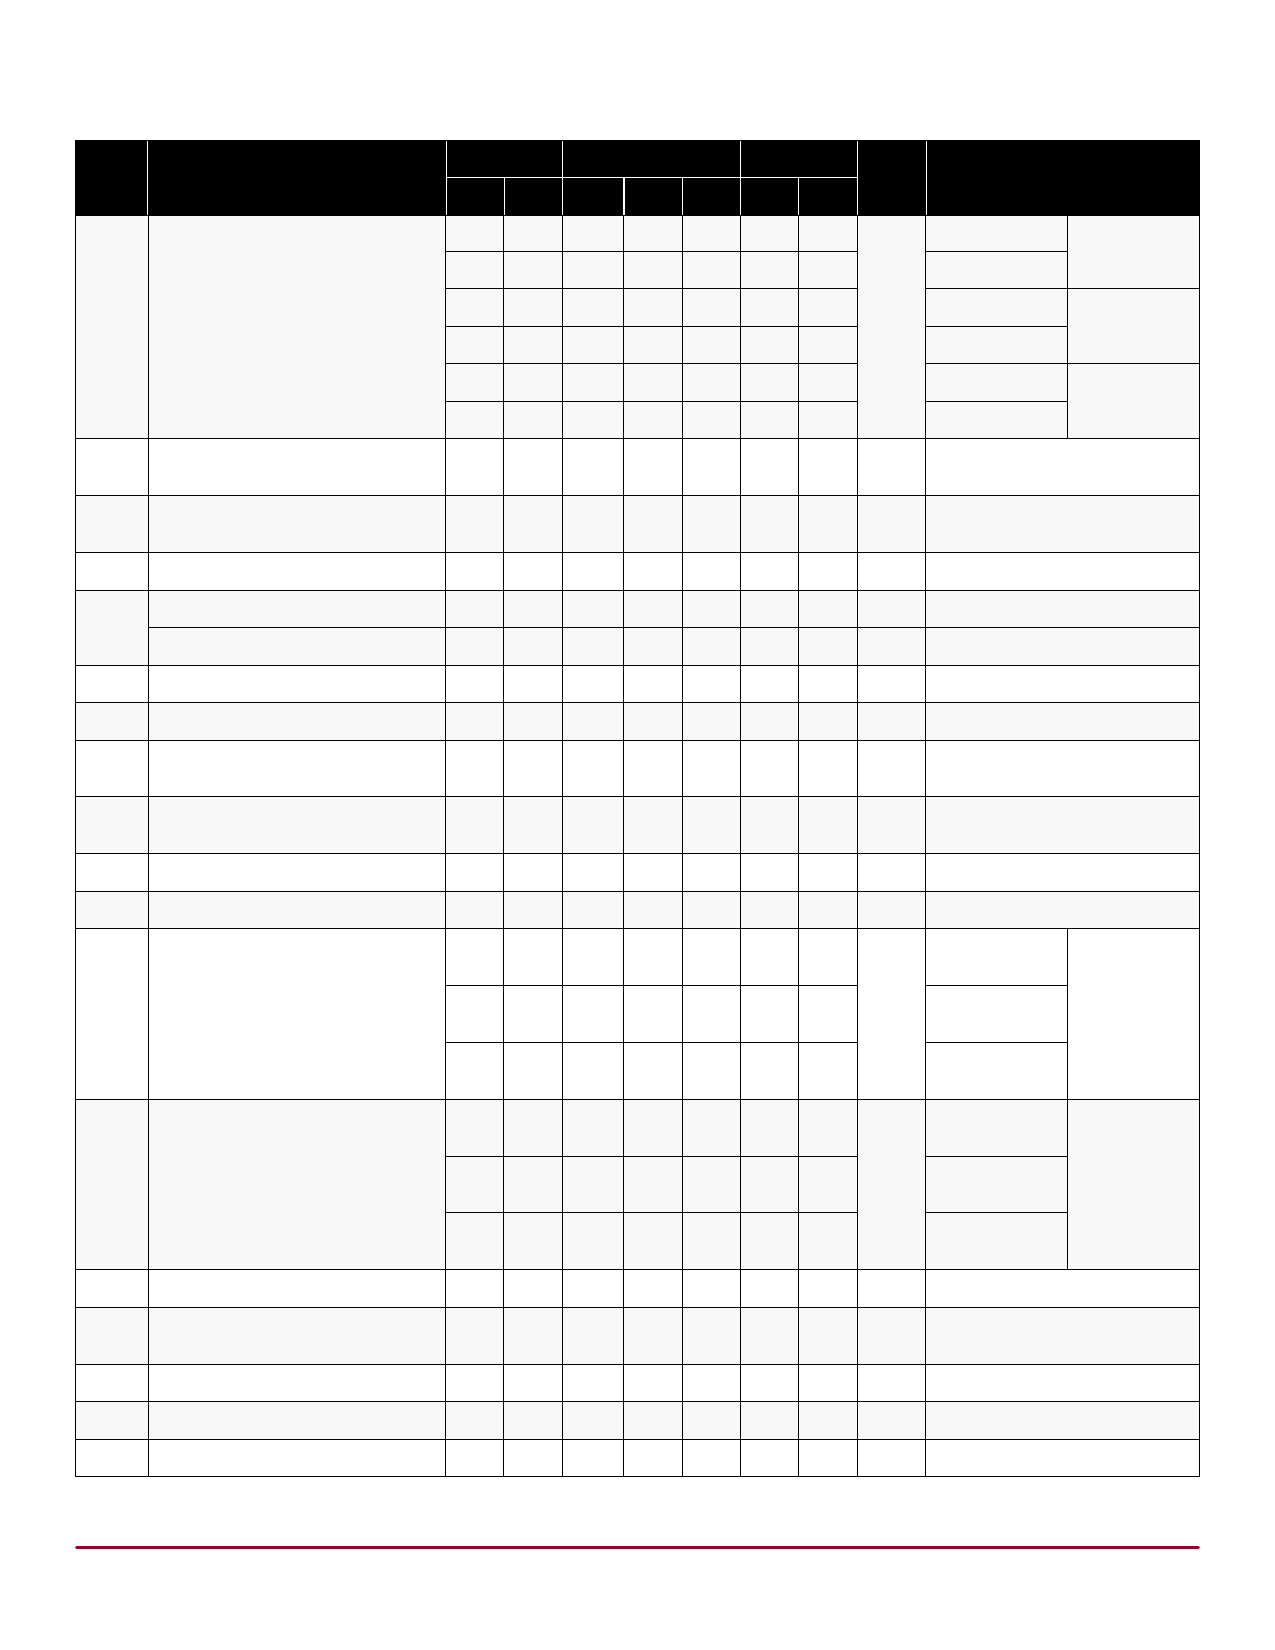 HV20320PJ pdf, ピン配列